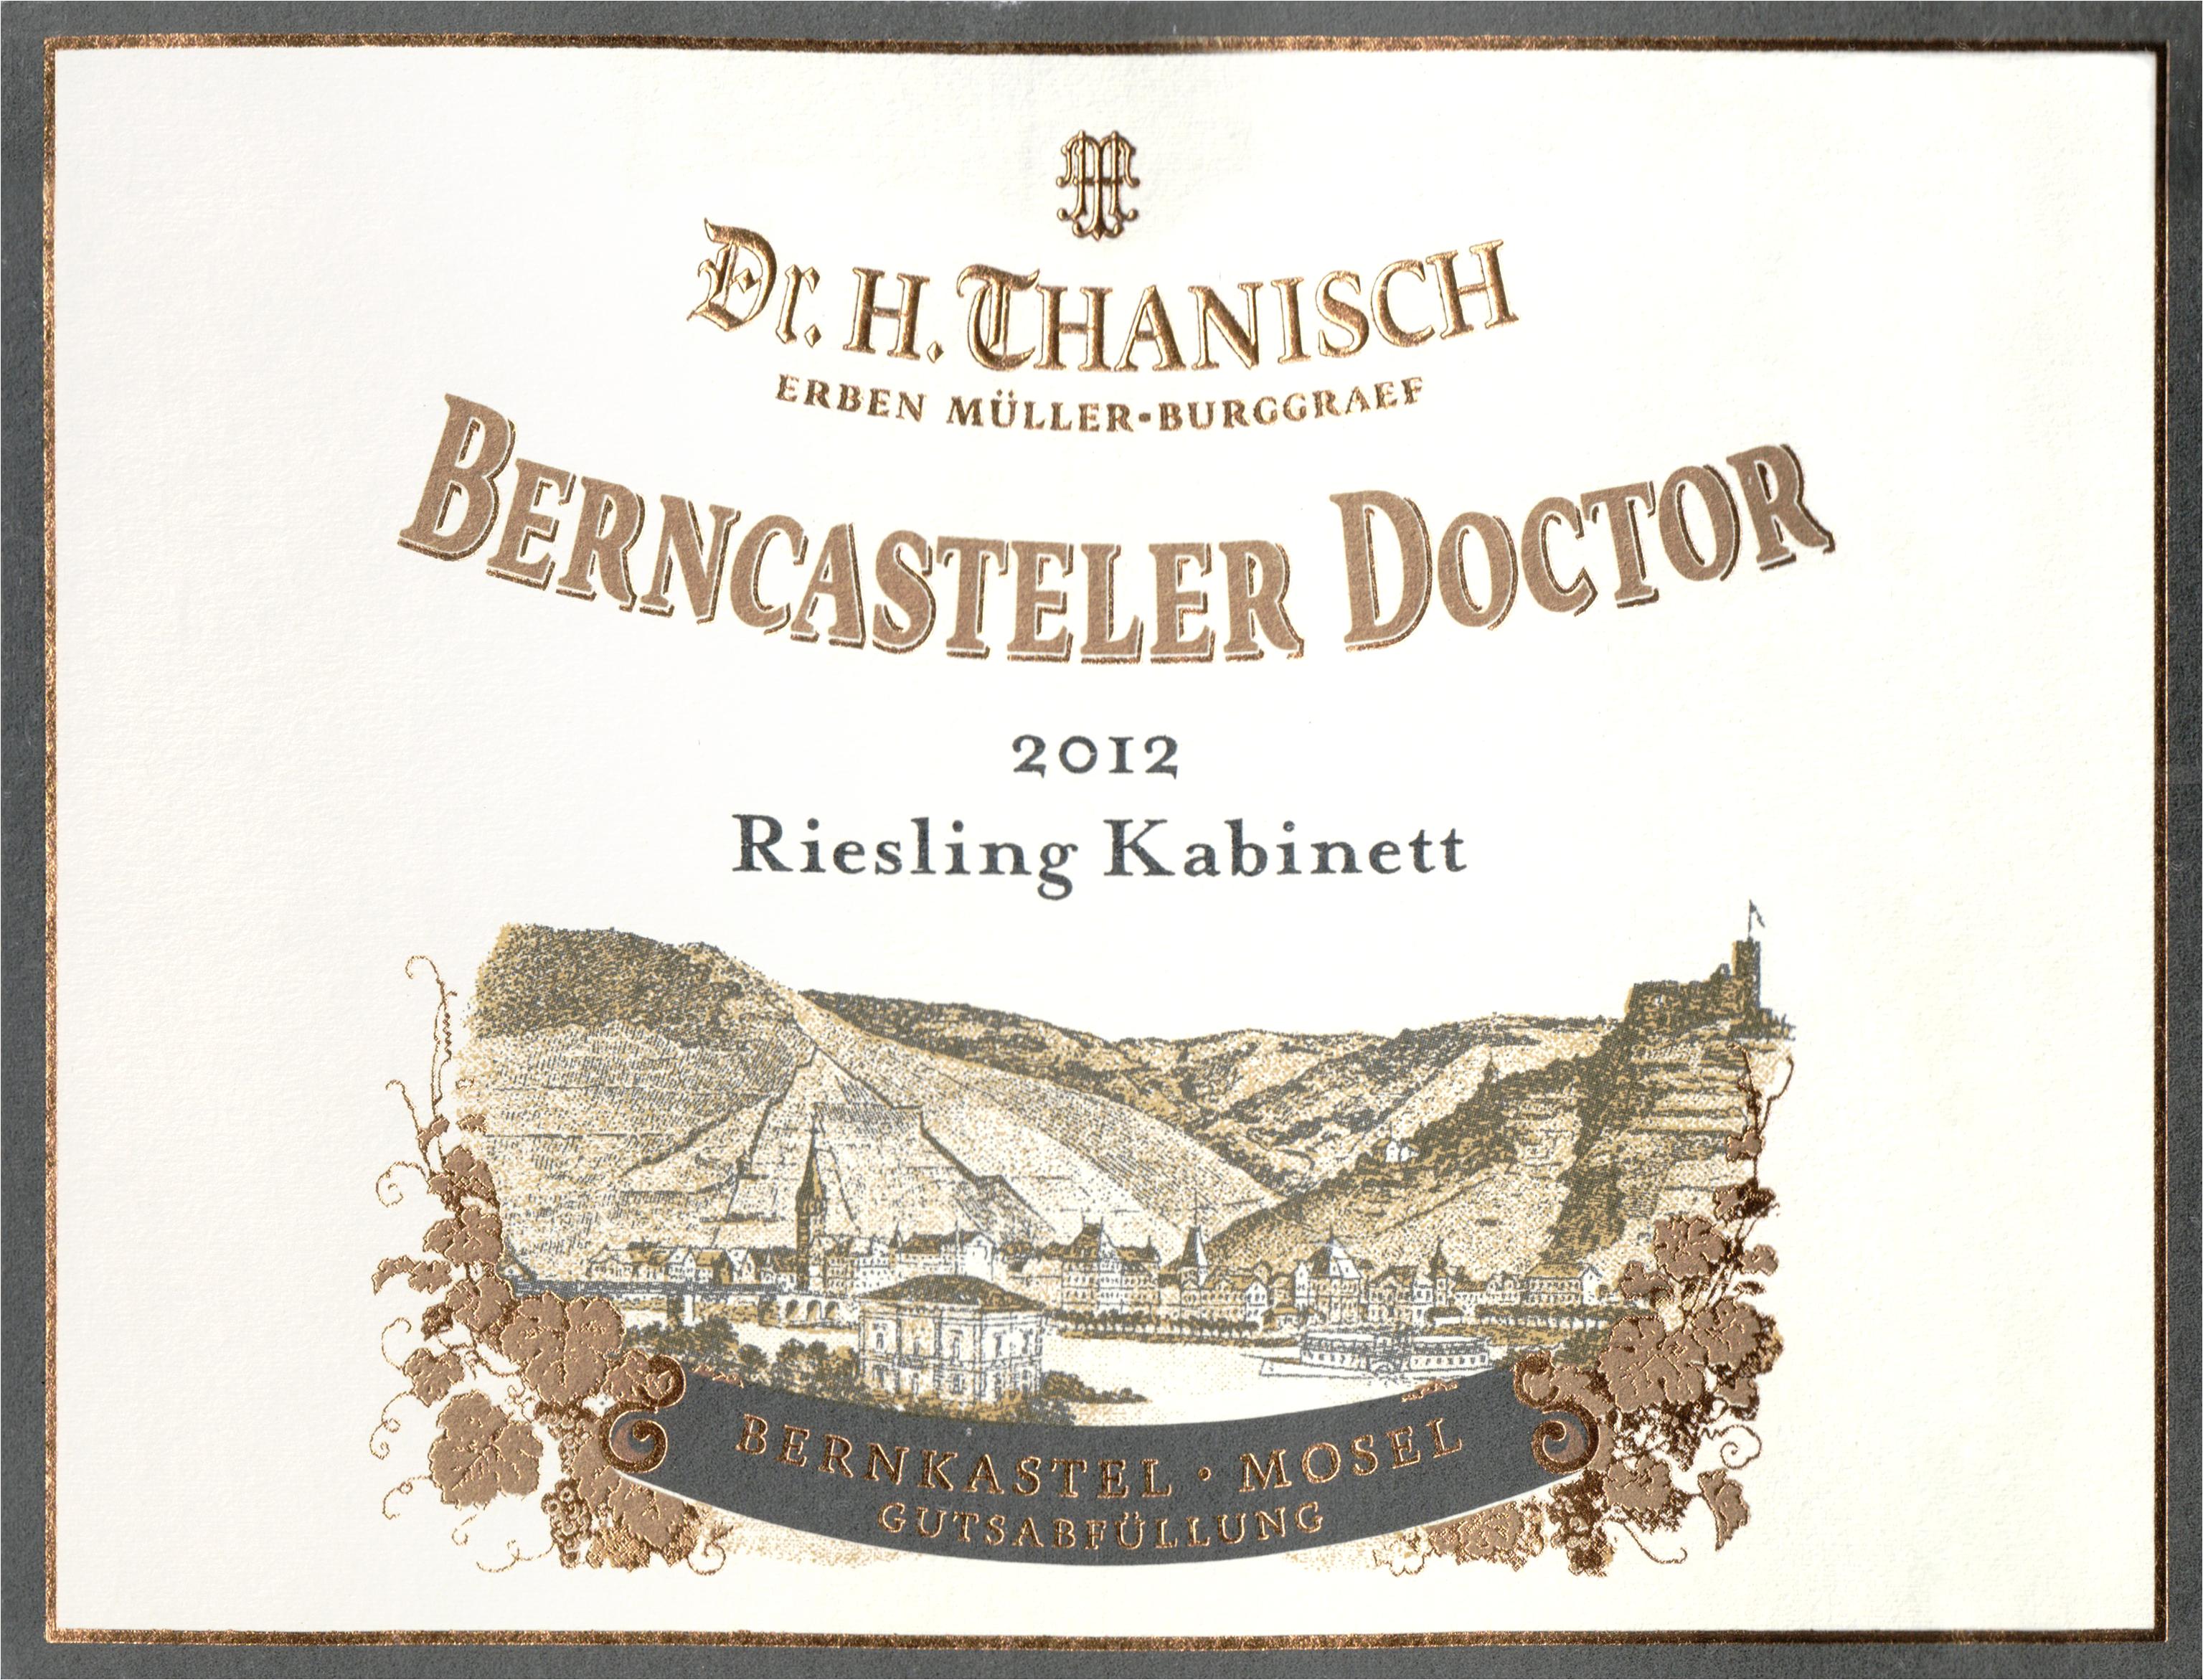 Dr. Thanisch Berncasteler Doctor Riesling Kabinett 2012